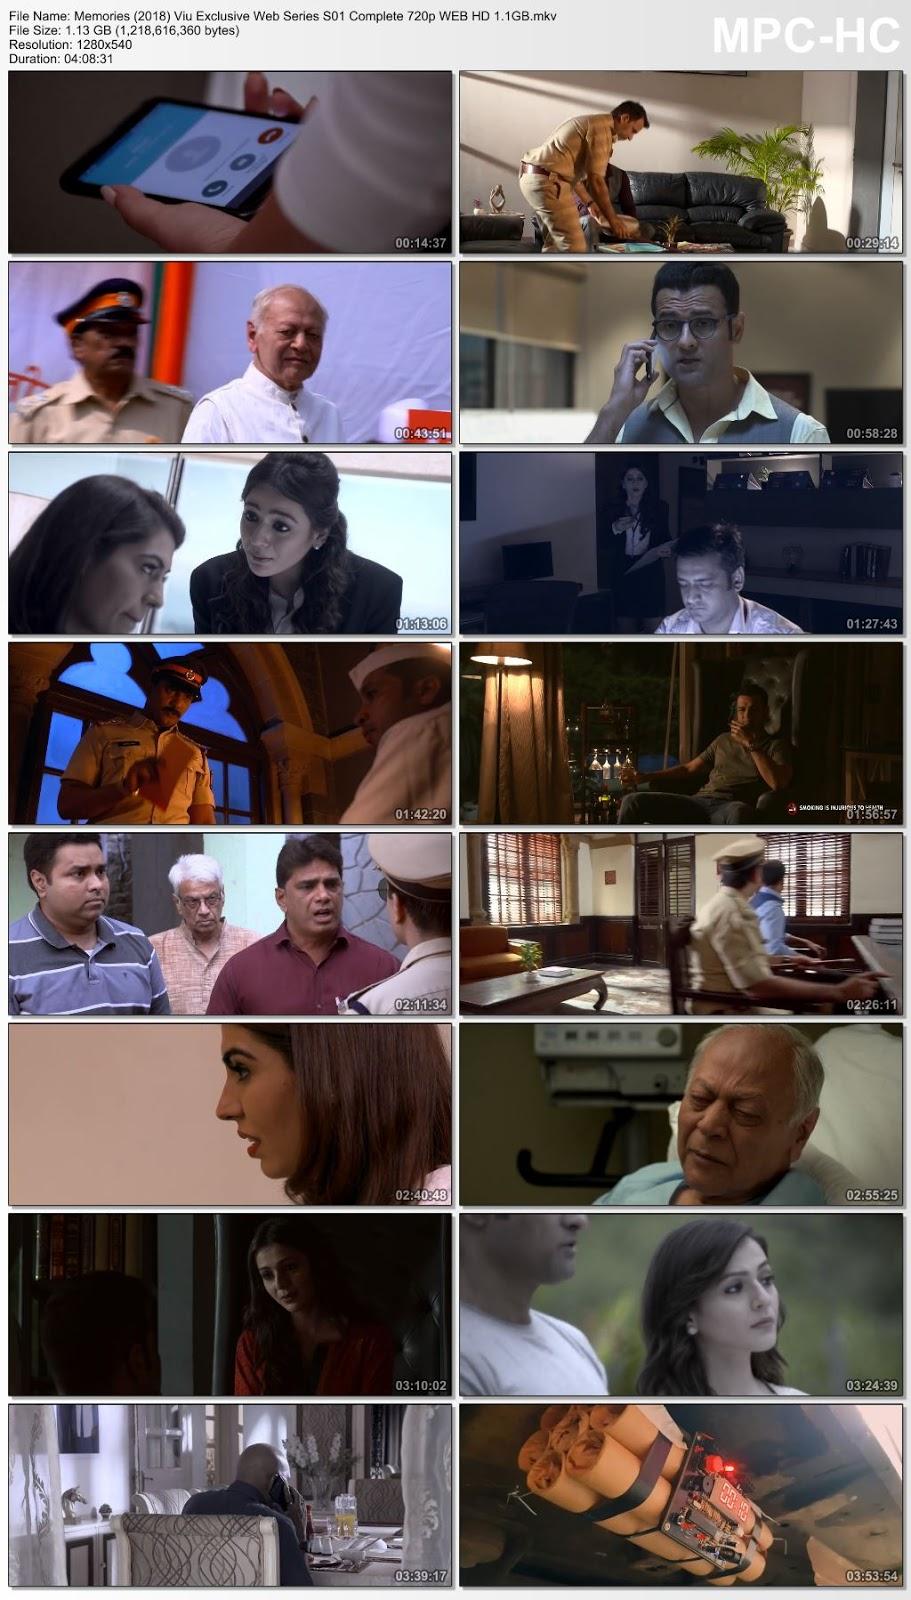 Memories (2018) Viu Exclusive Web Series S01 Complete 720p WEB-HD